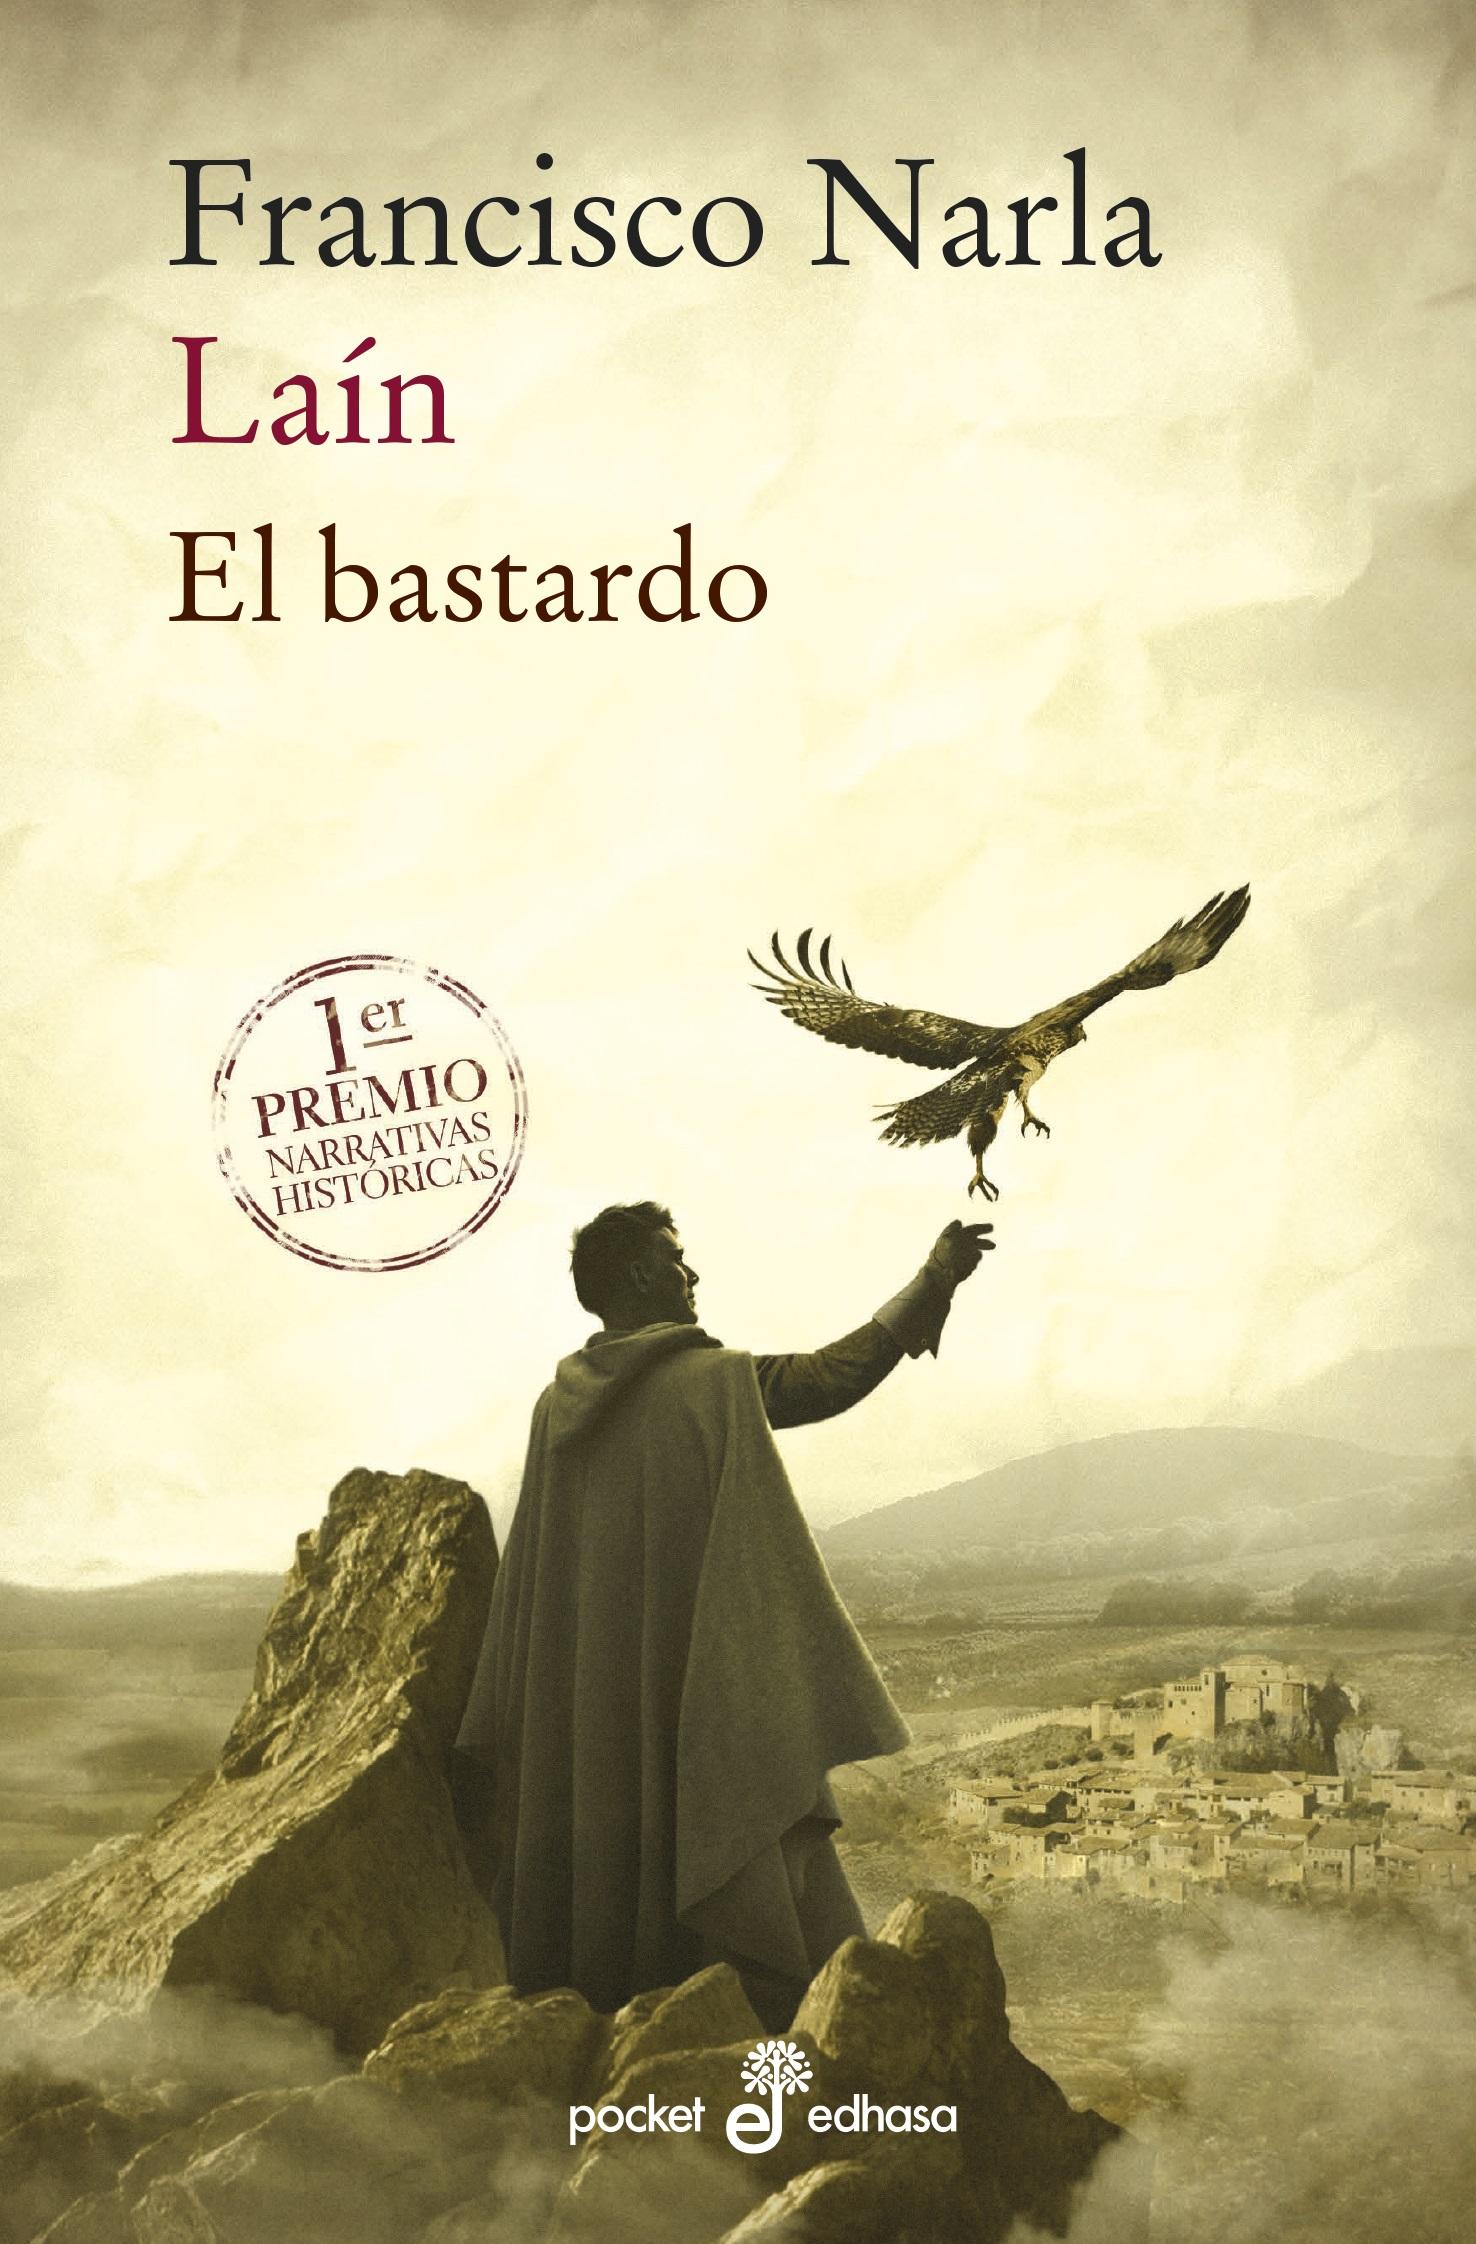 LAÍN. El bastardo (Bolsillo)